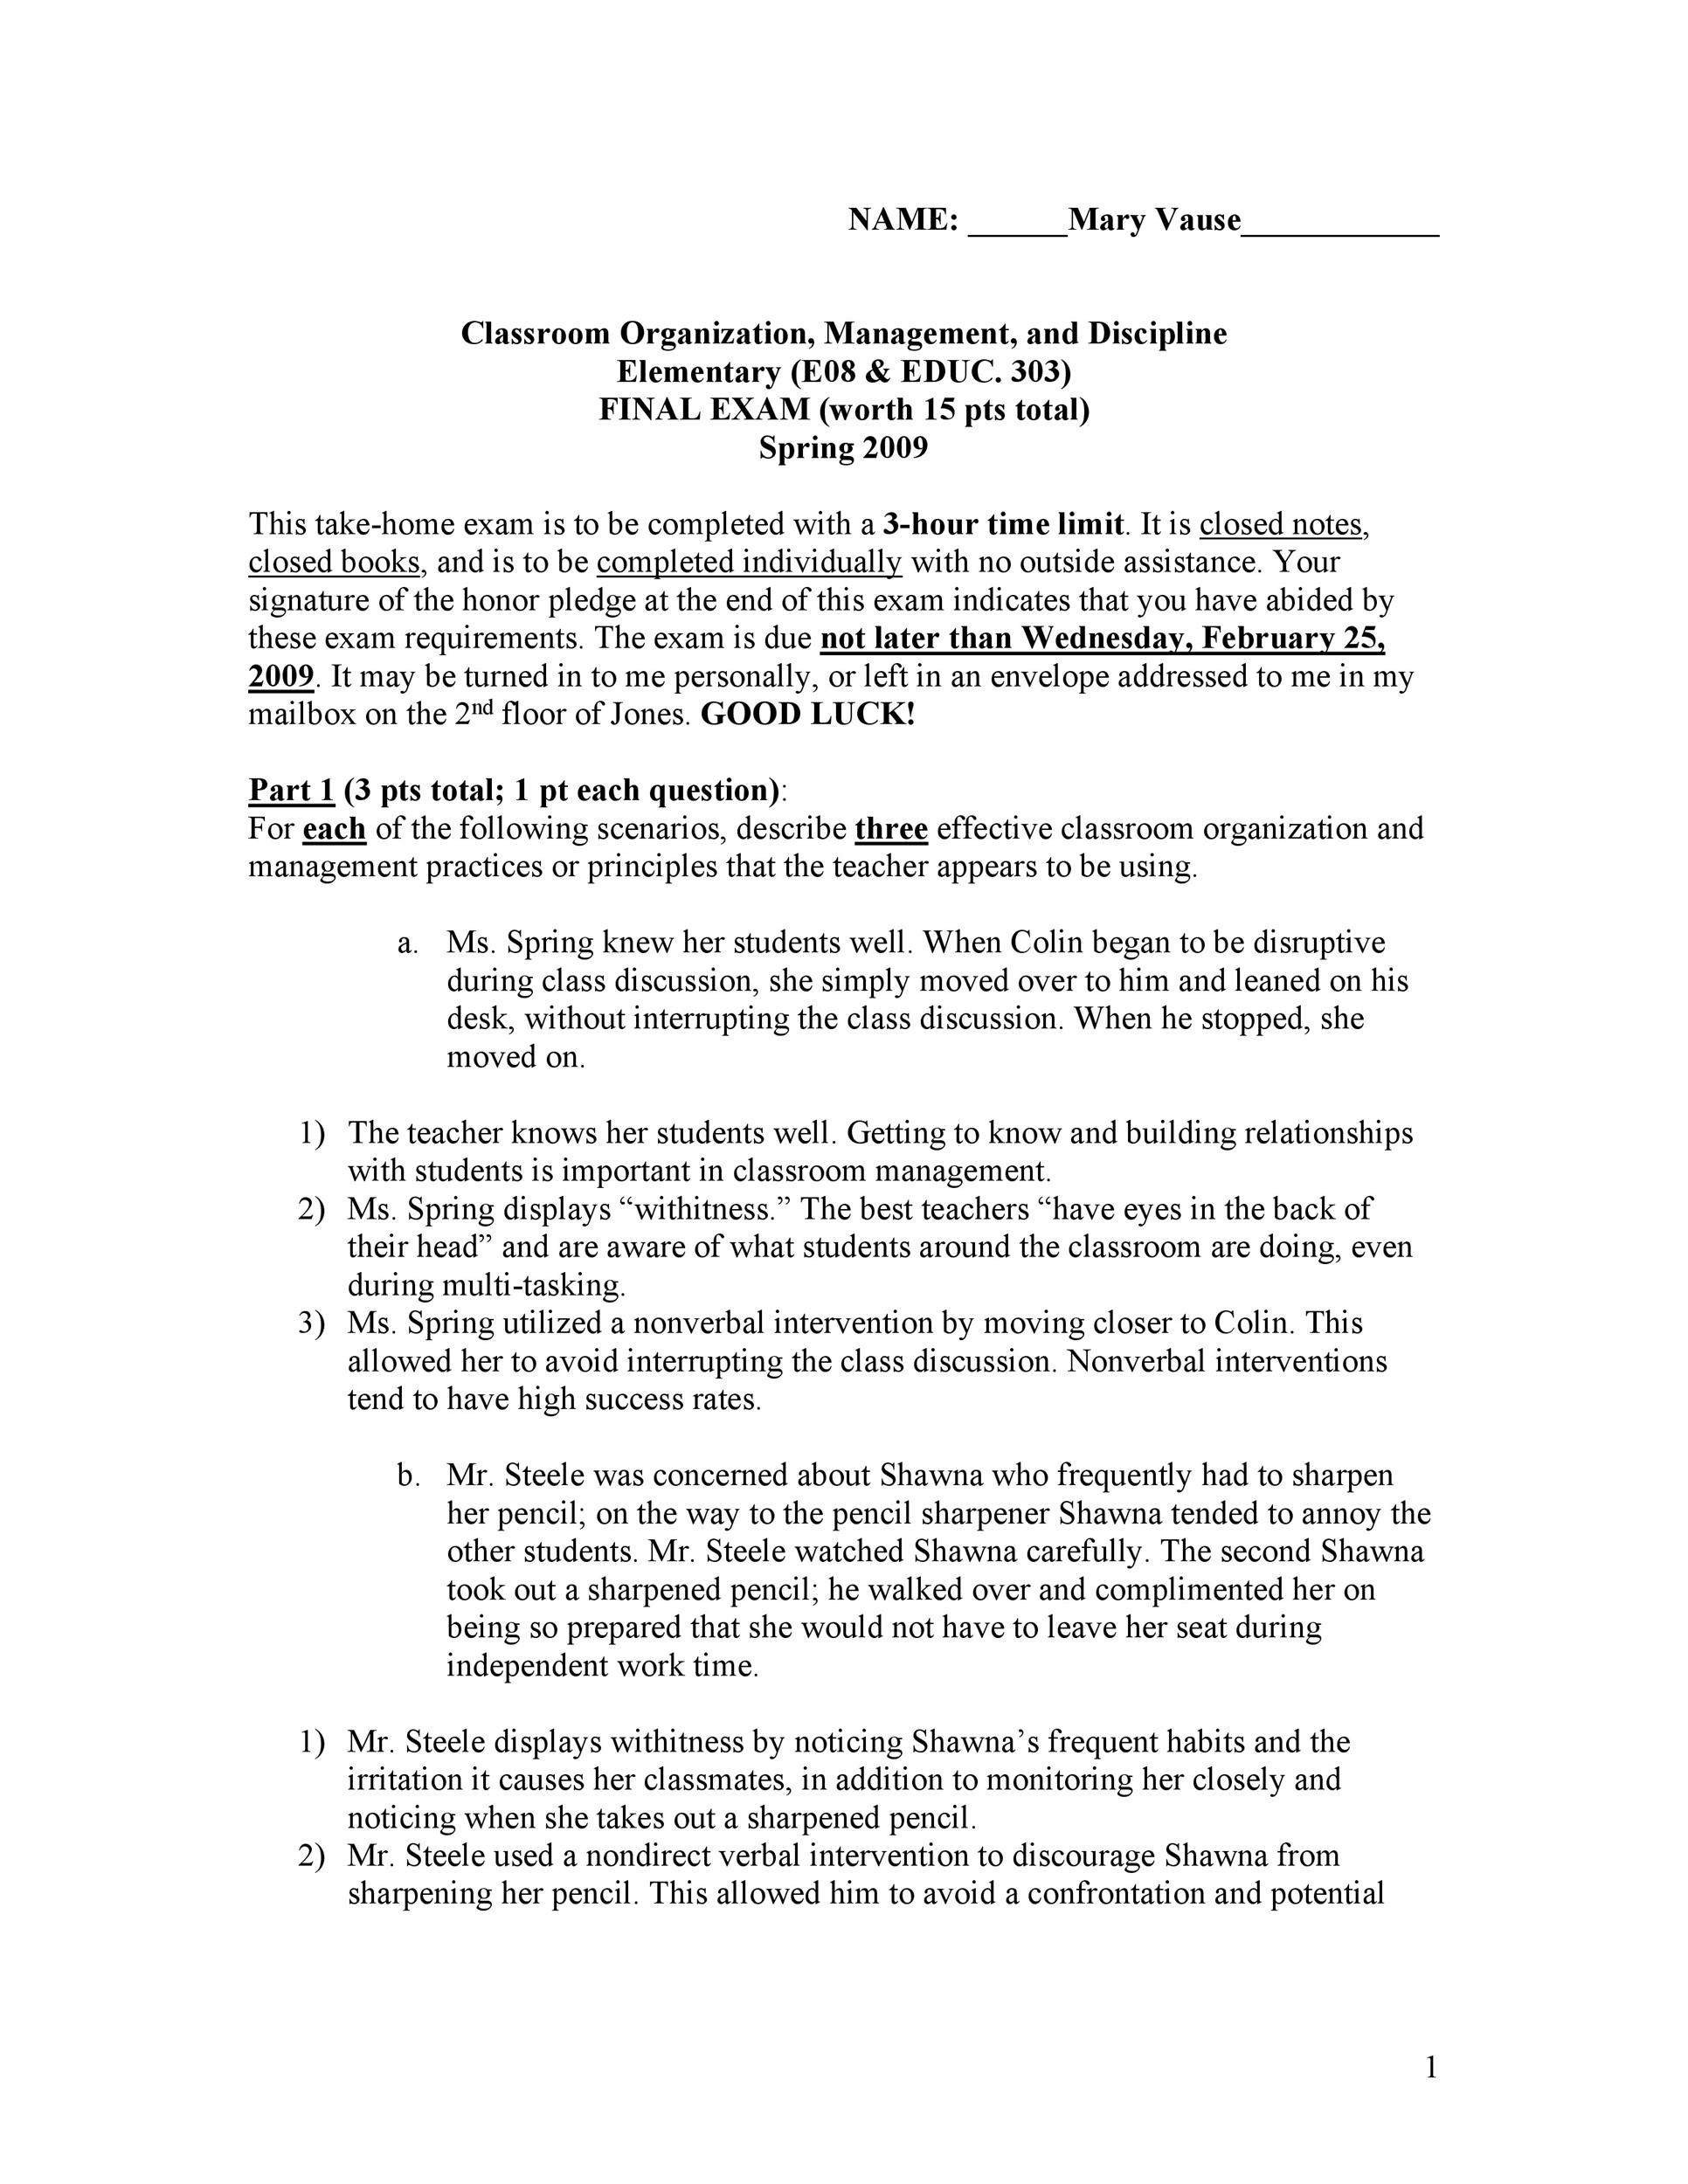 Free classroom management plan 32